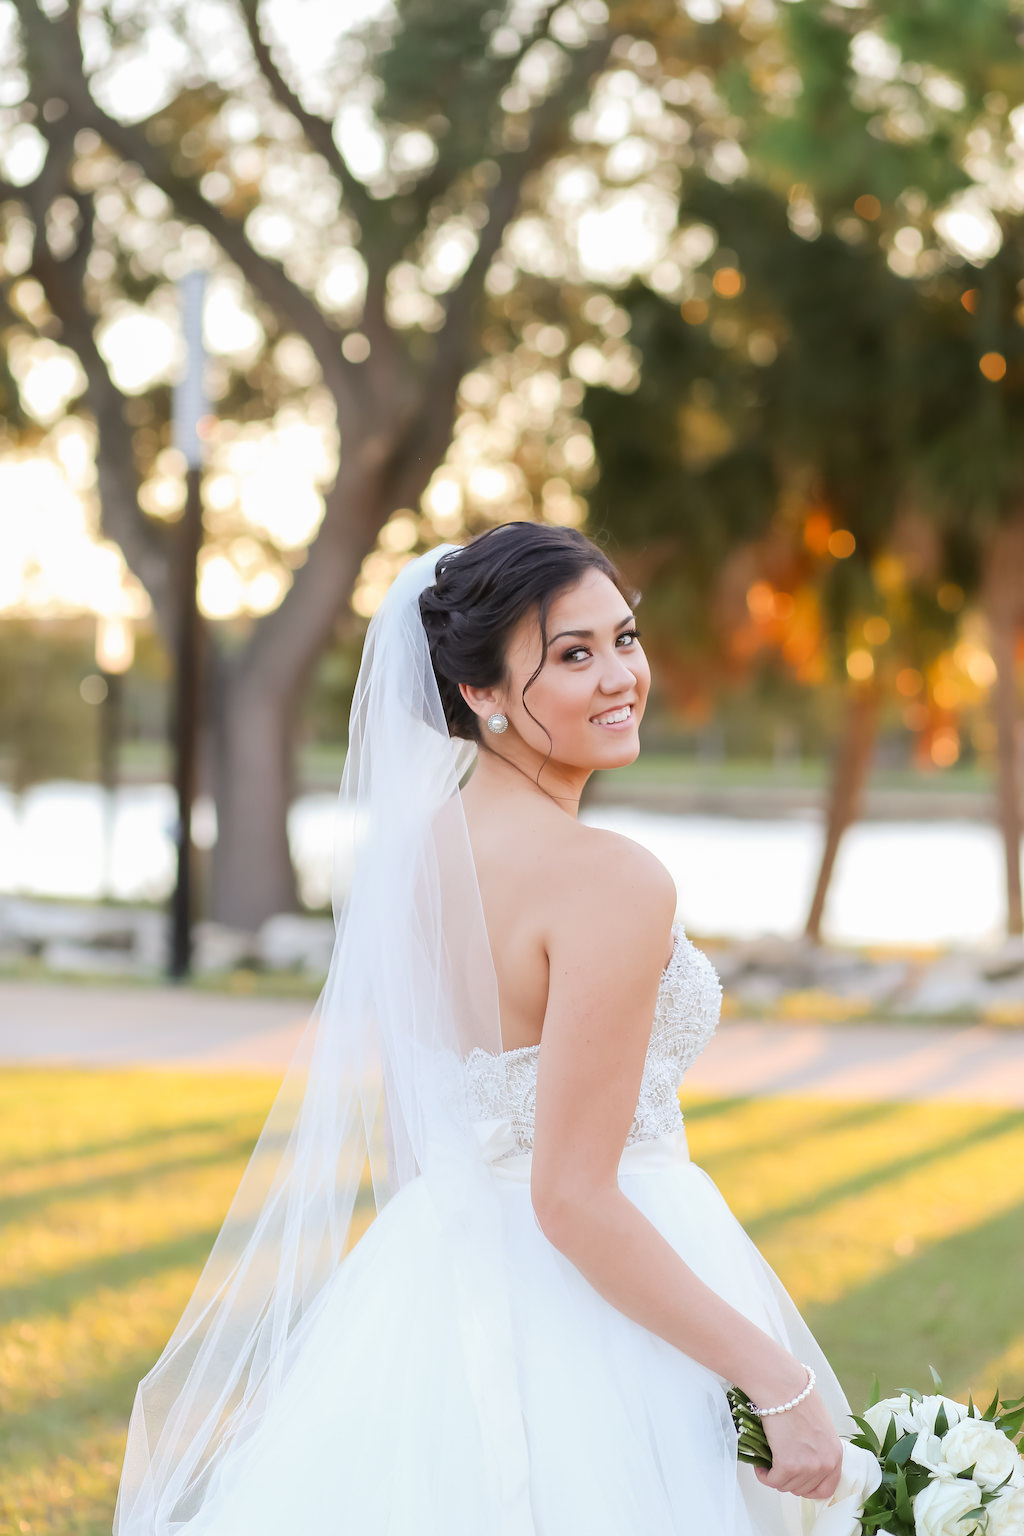 Florida Outdoor Bride Wedding Portrait   Downtown Tampa Wedding Photographer Lifelong Photography Studios